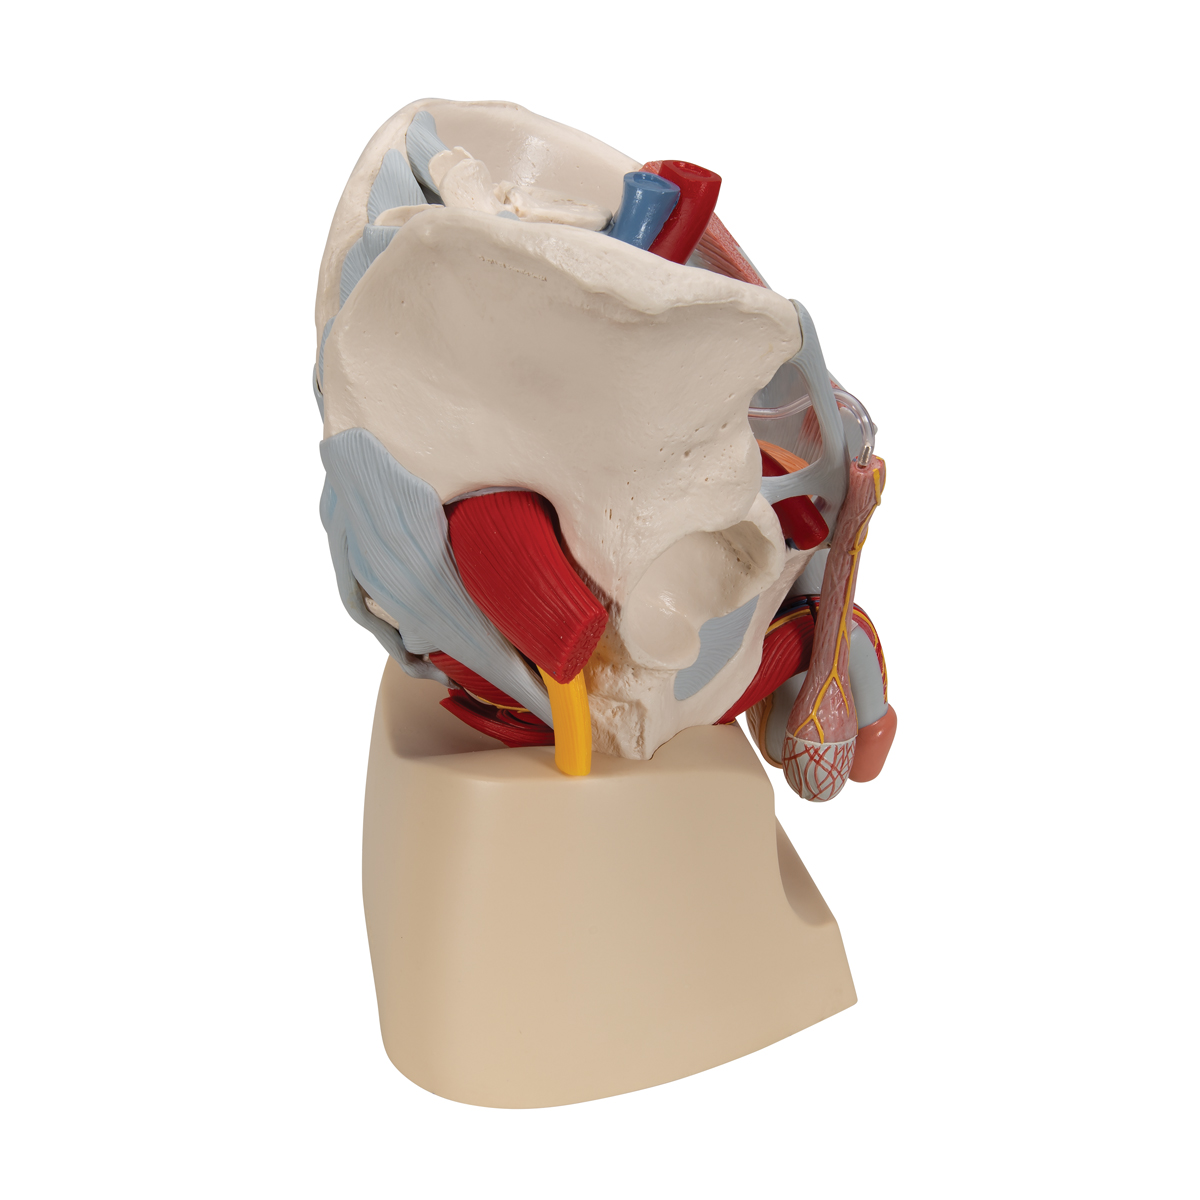 Male pelvis (7-parts) - 1013282 - 3B Scientific - H21/3 - Genital ...